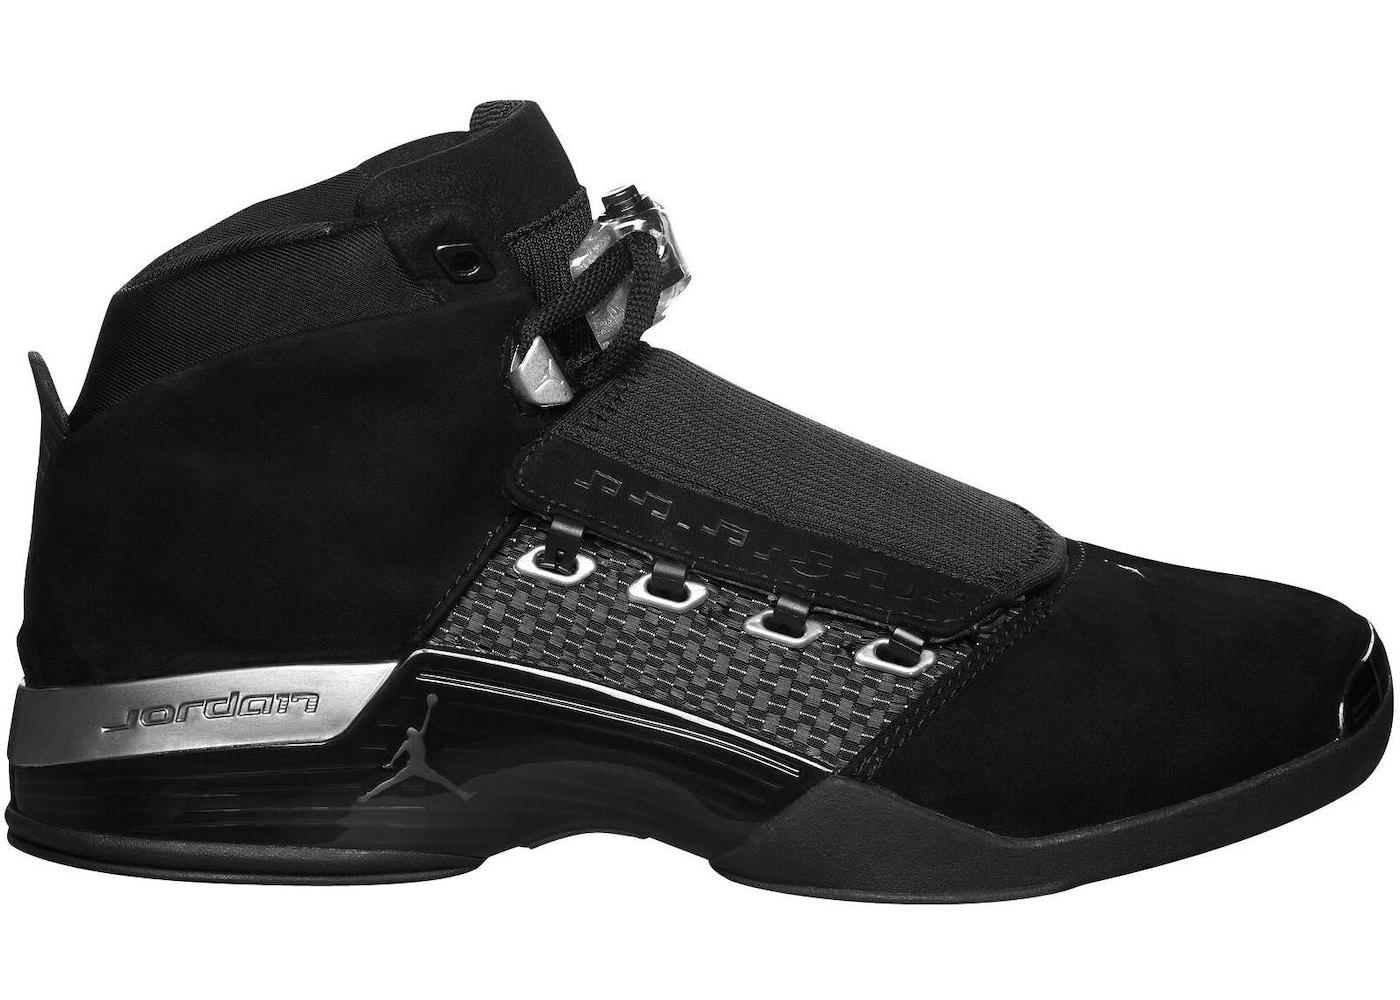 0af73018e26884 Jordan 17 Retro Black Silver CDP (2008) - 322721-001